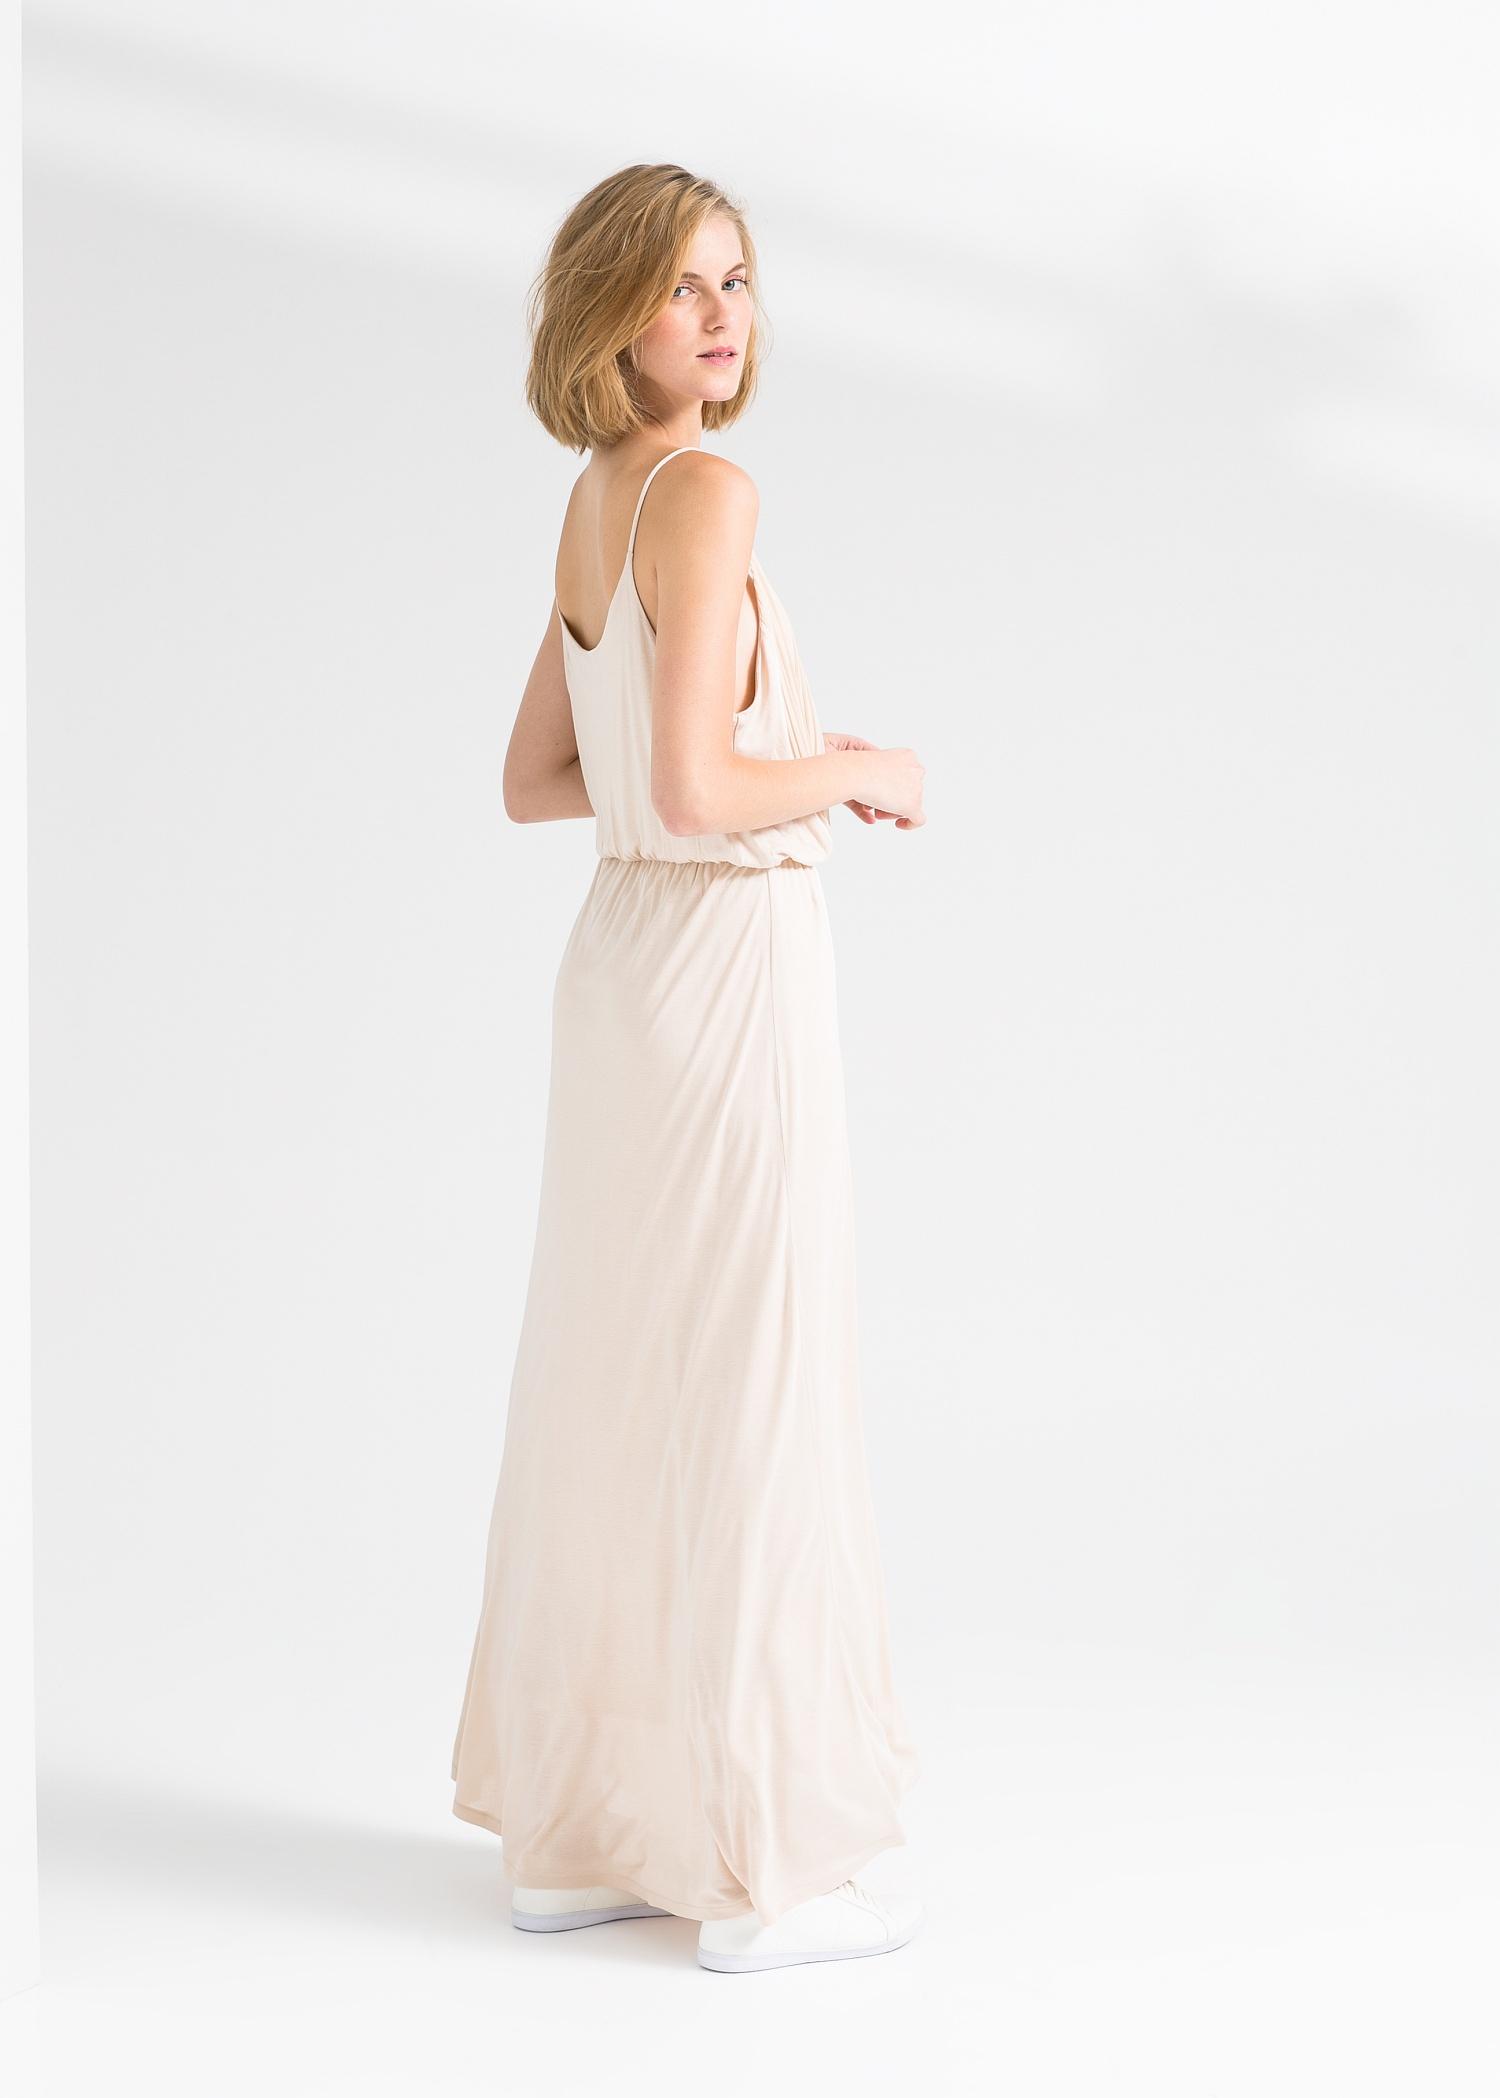 Lyst - Mango Pleated Long Dress in White